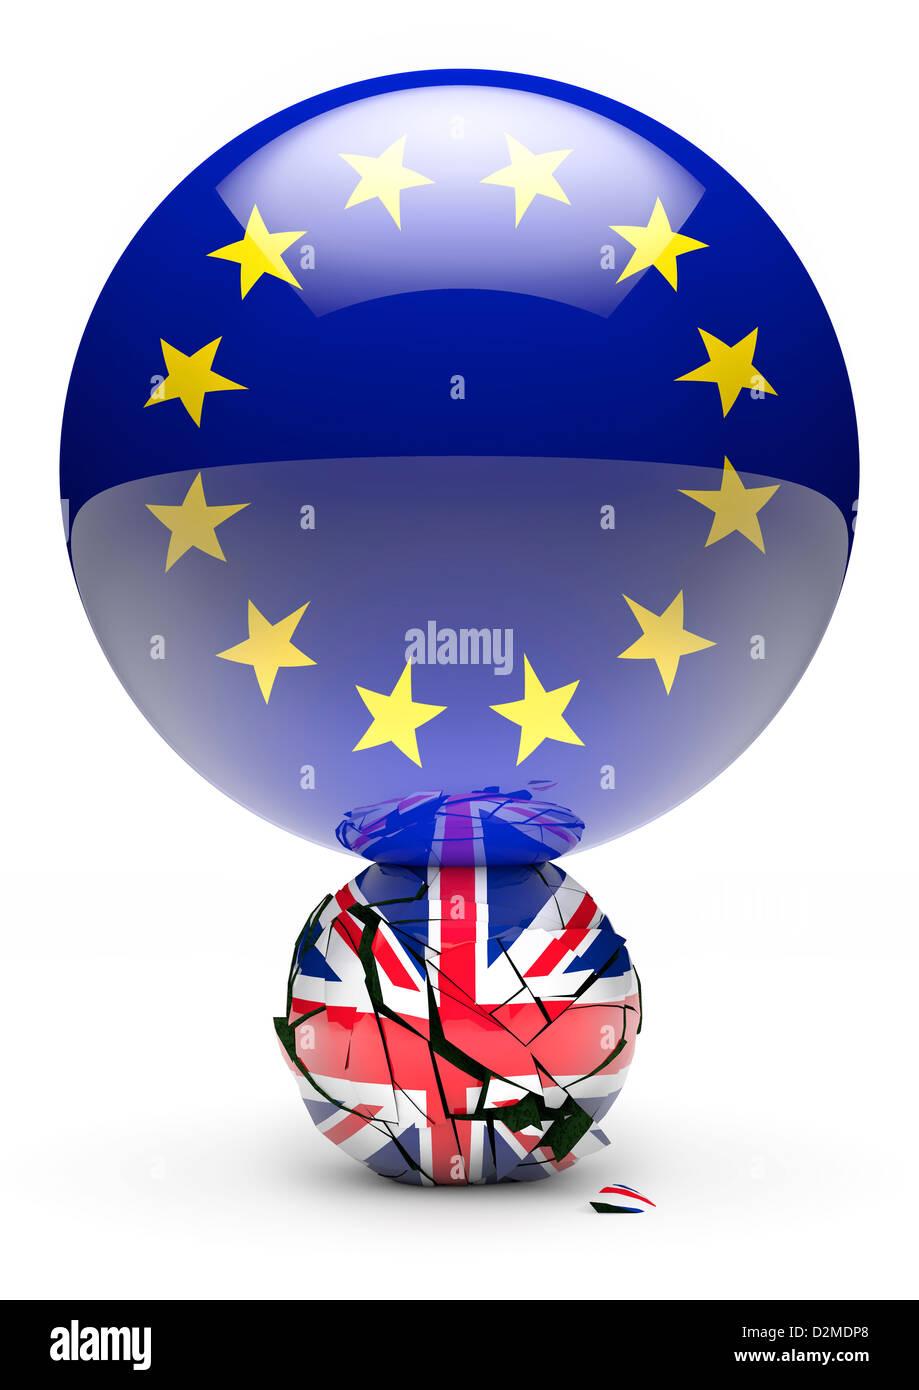 Large European Flag sphere crushing smaller British Union Flag sphere - EU break up / power / debt crisis concept - Stock Image